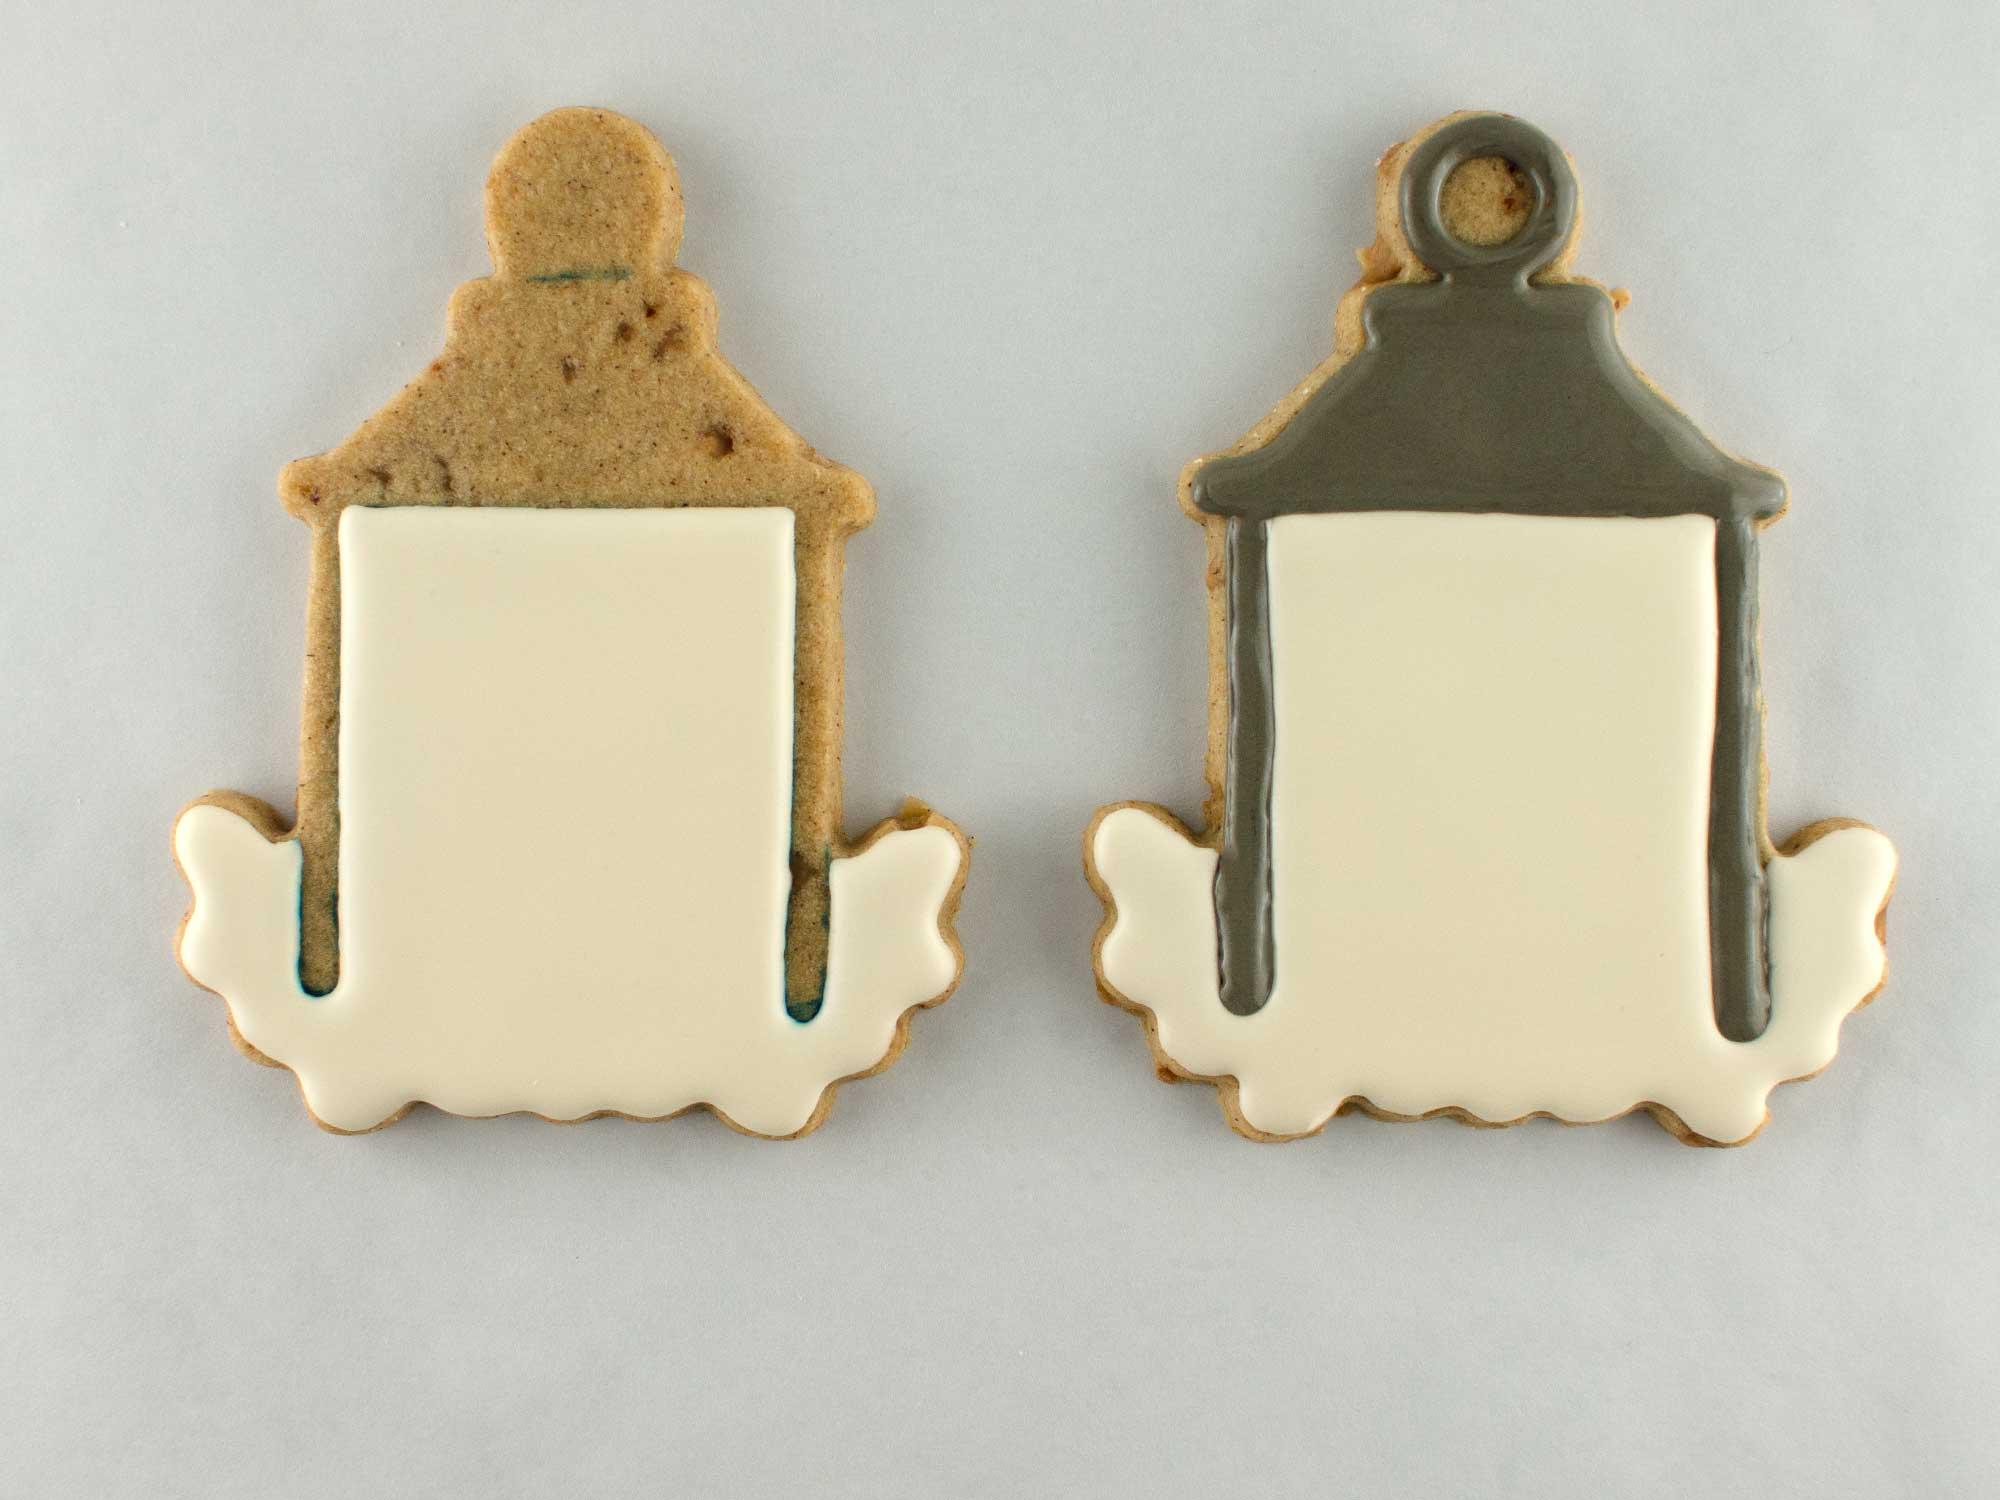 autumn lantern cookies step 1